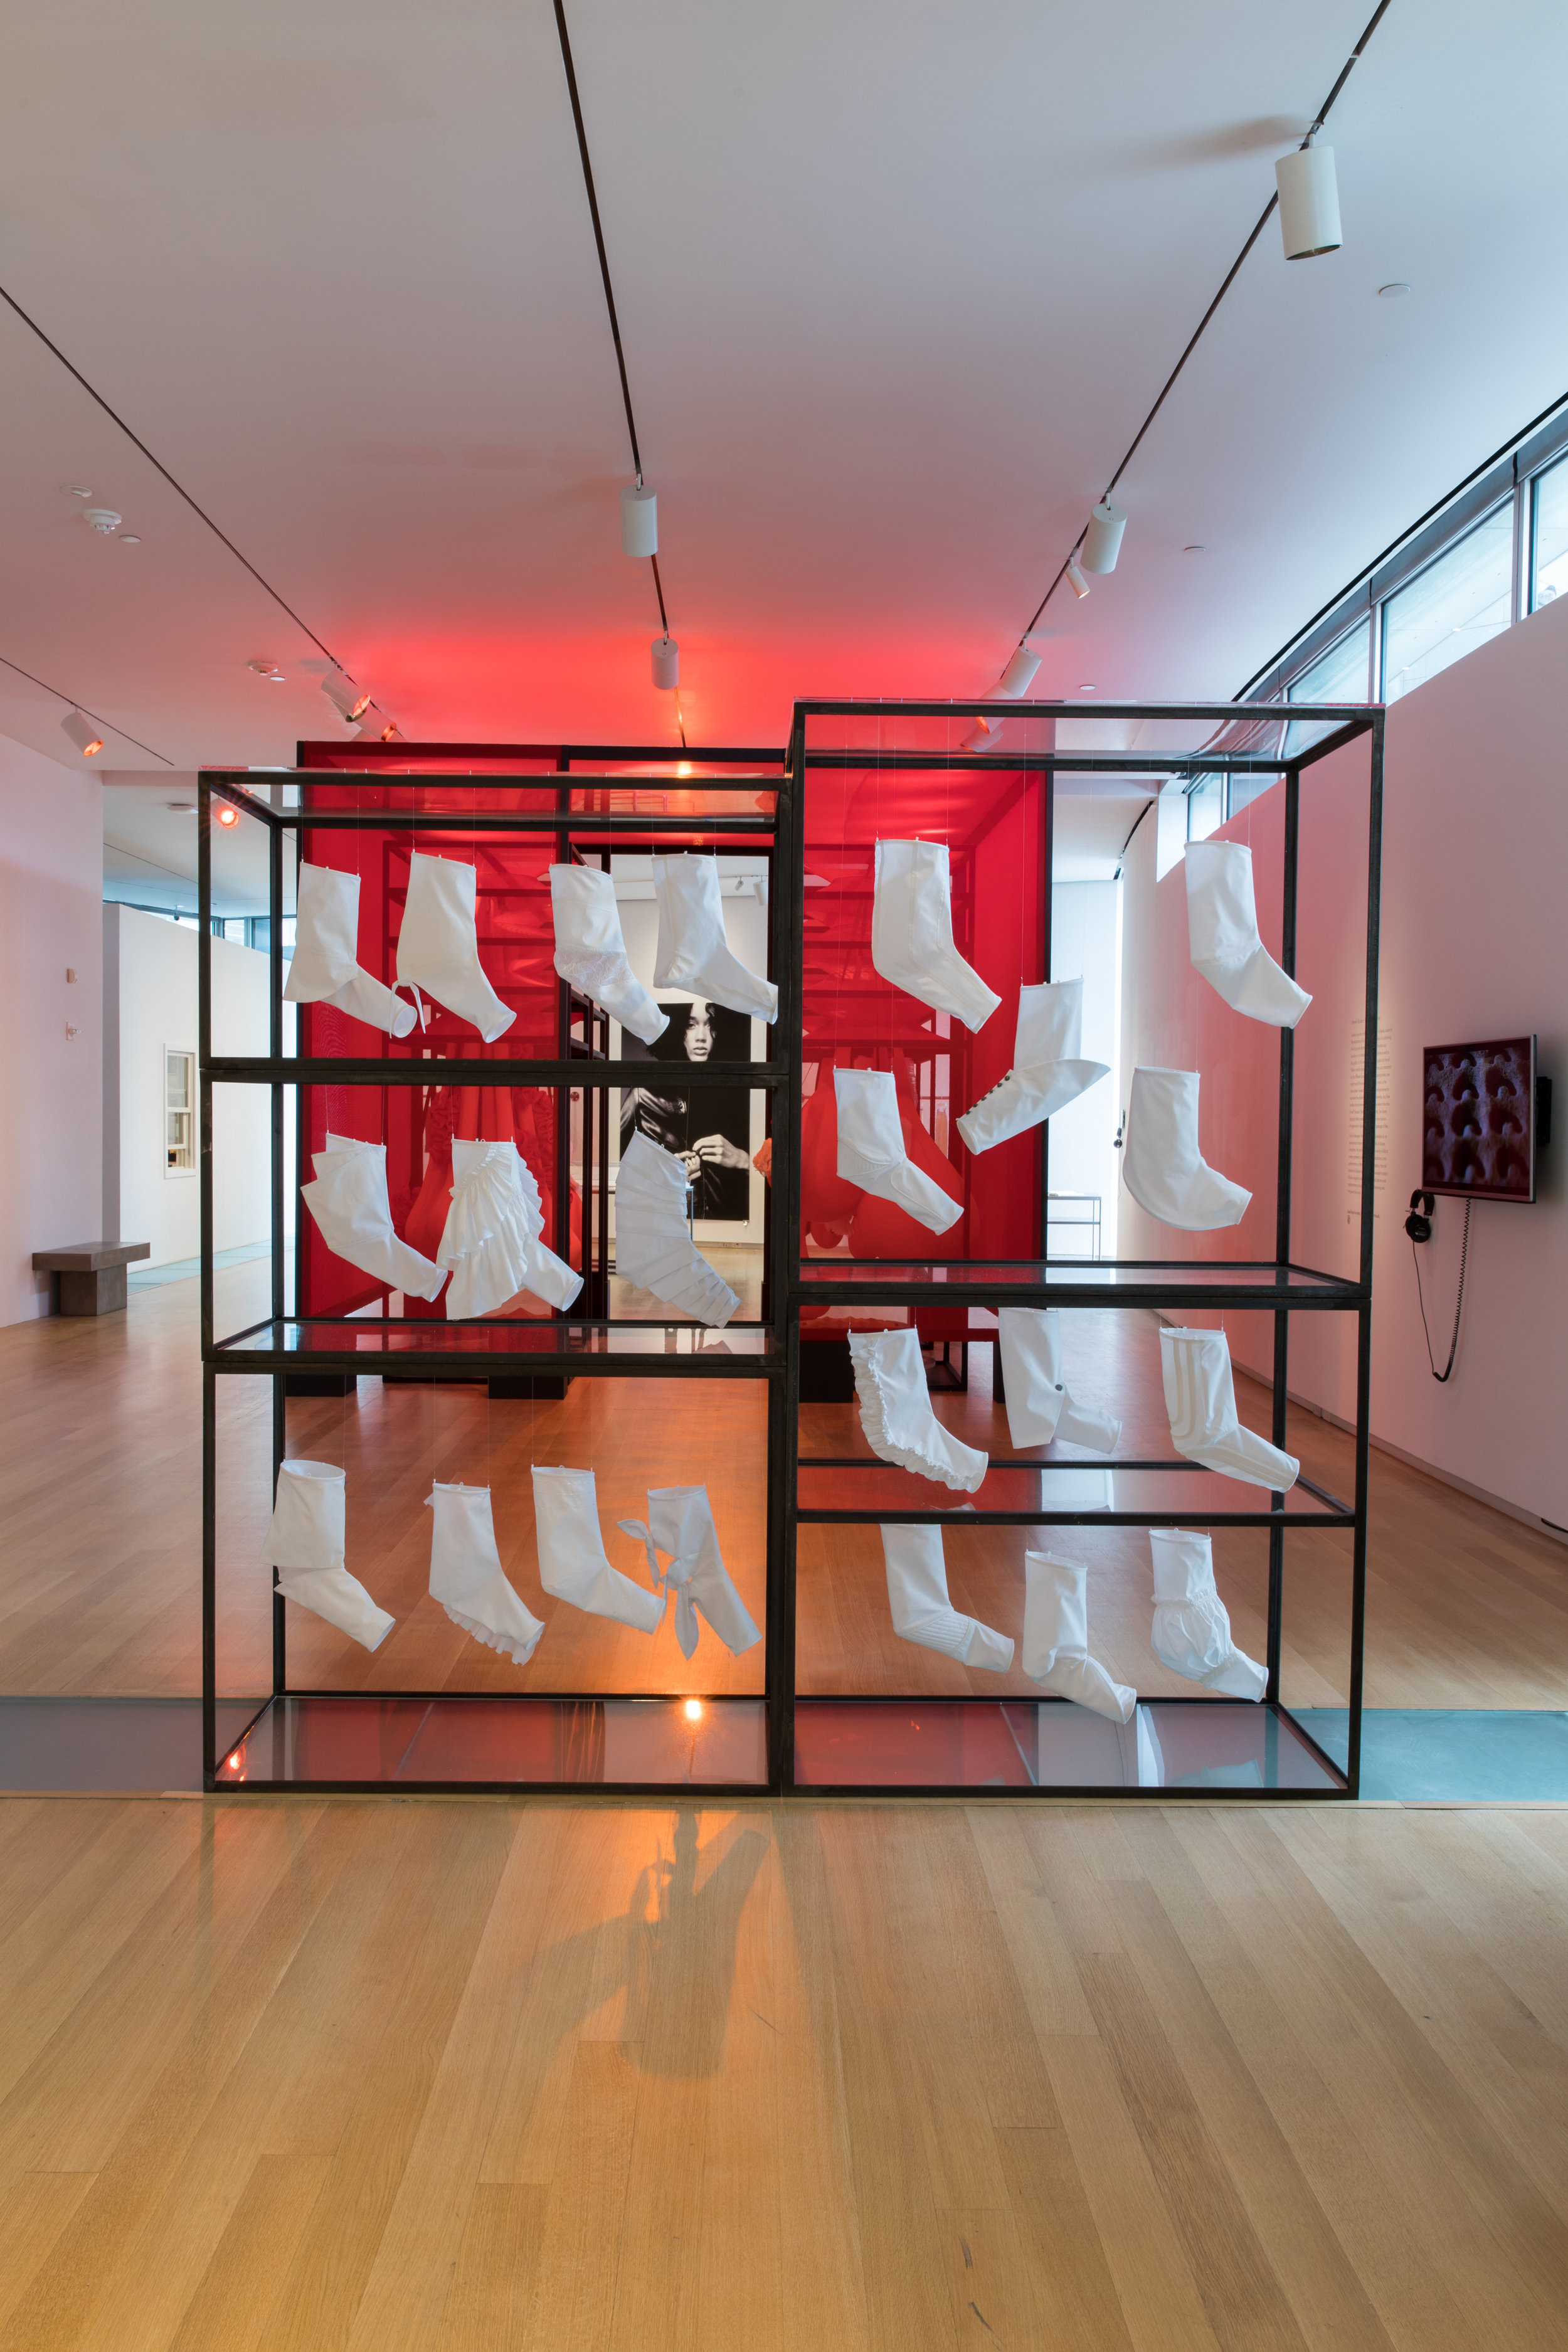 Lucy Jones, 'Seated Sleeves', installation, 2017